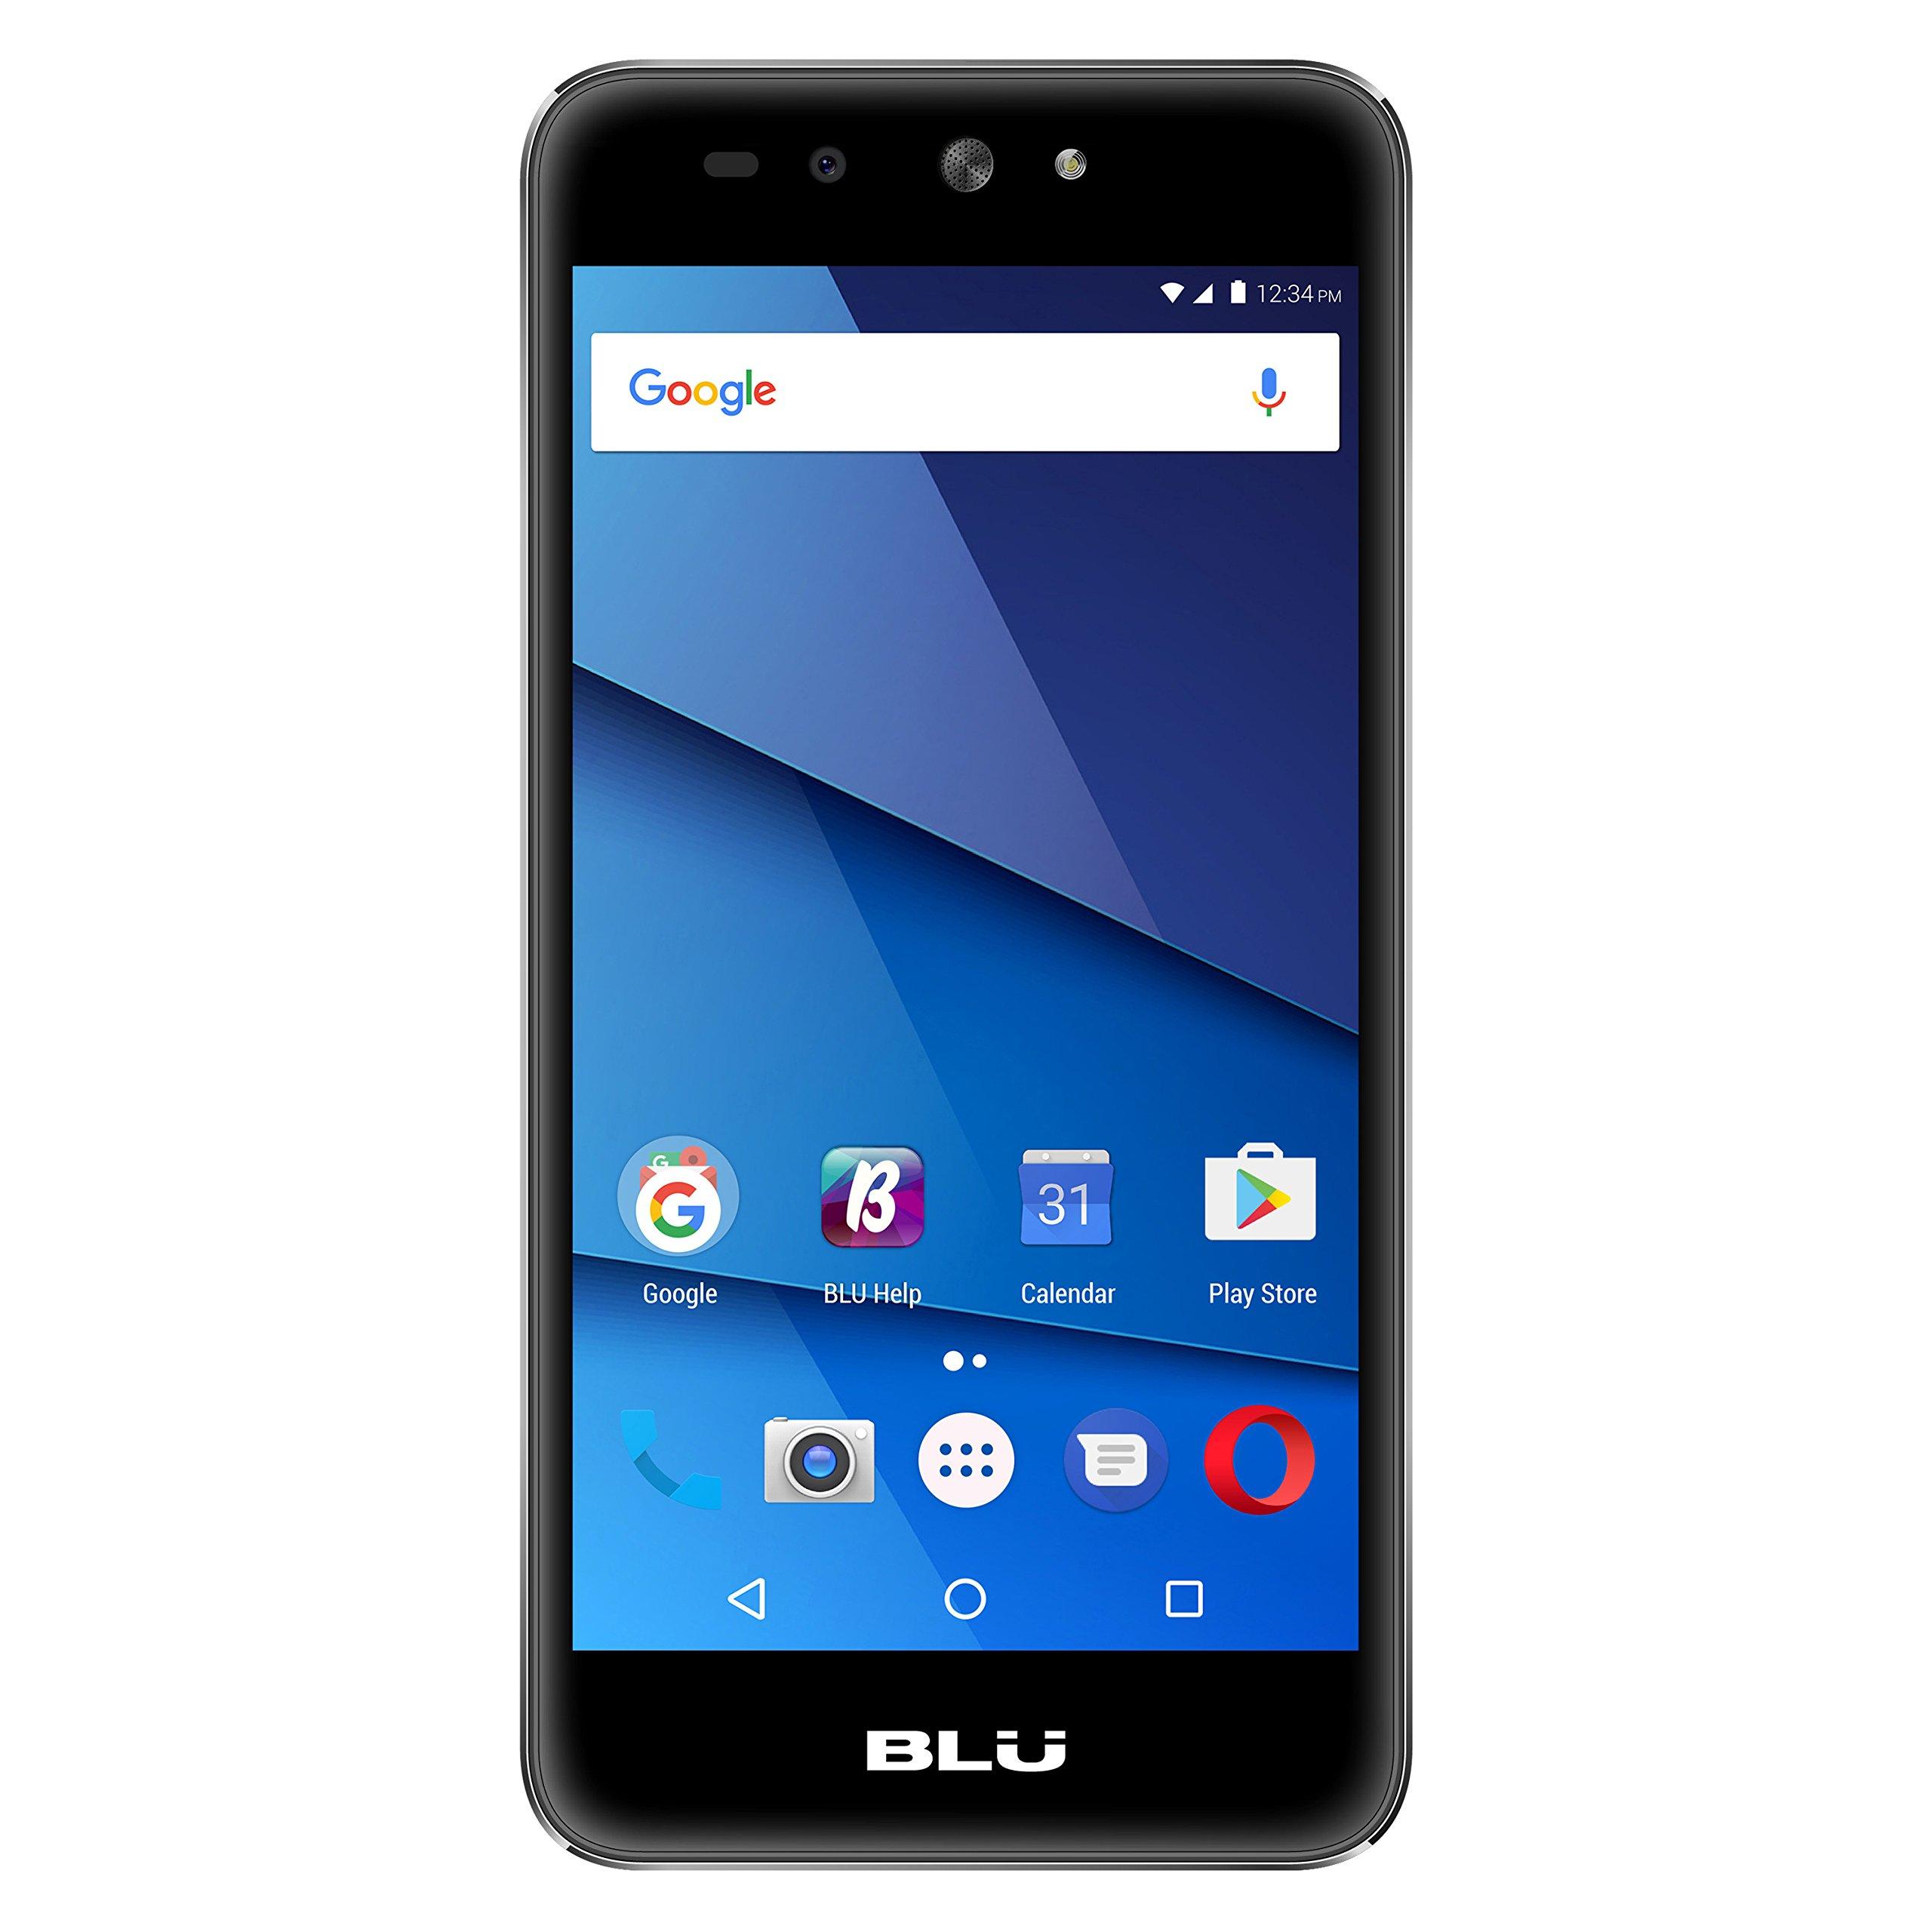 BLU Grand X LTE -Black Factory Unlocked Phone - 5'' Screen - 8GB - Black (U.S. Warranty)